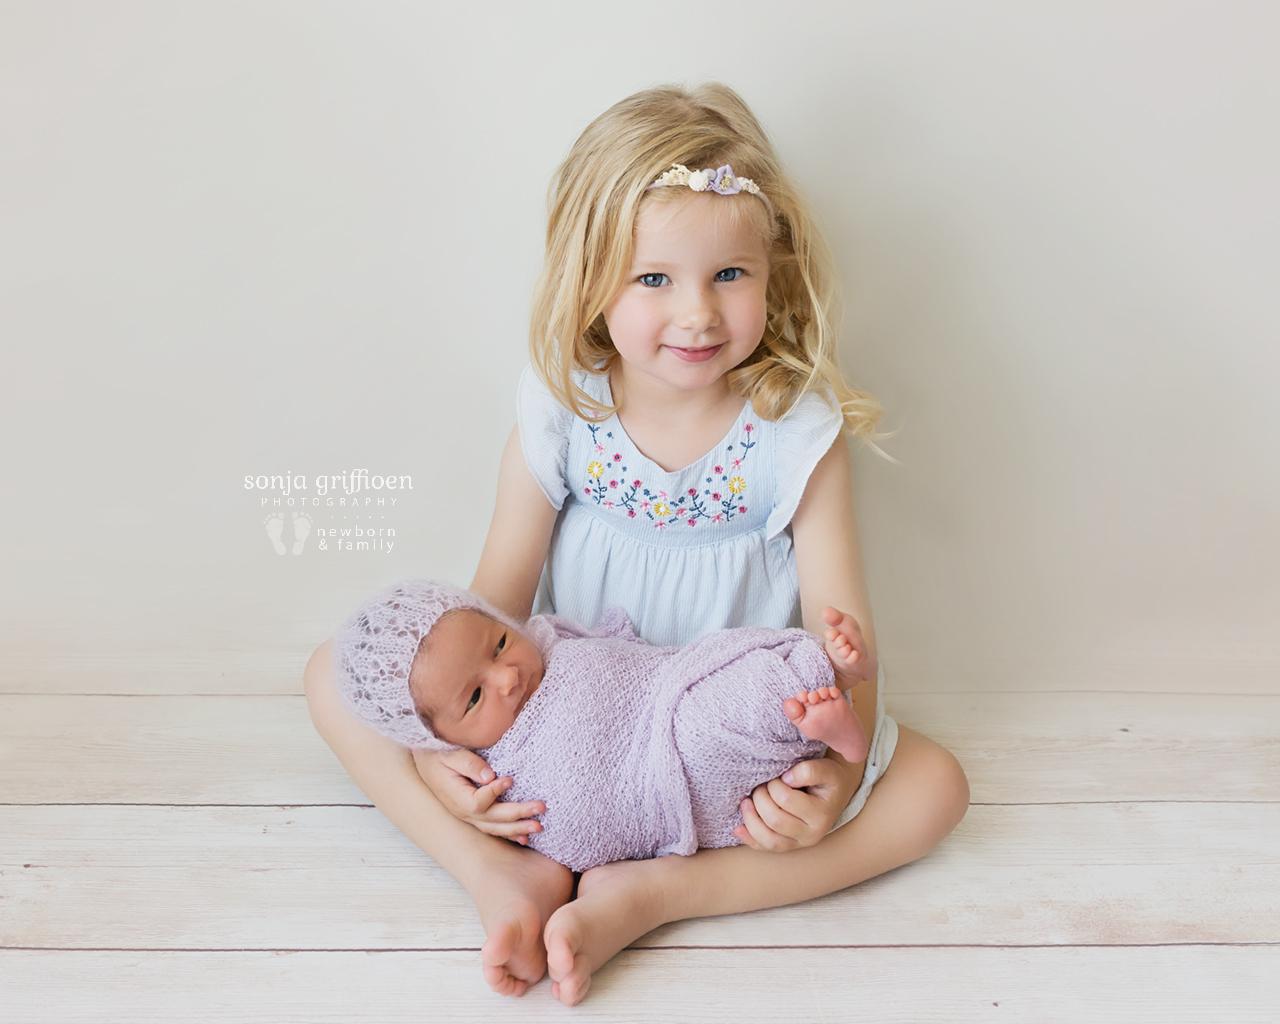 Maple-Rose-Newborn-Brisbane-Newborn-Photographer-Sonja-Griffioen-01.jpg